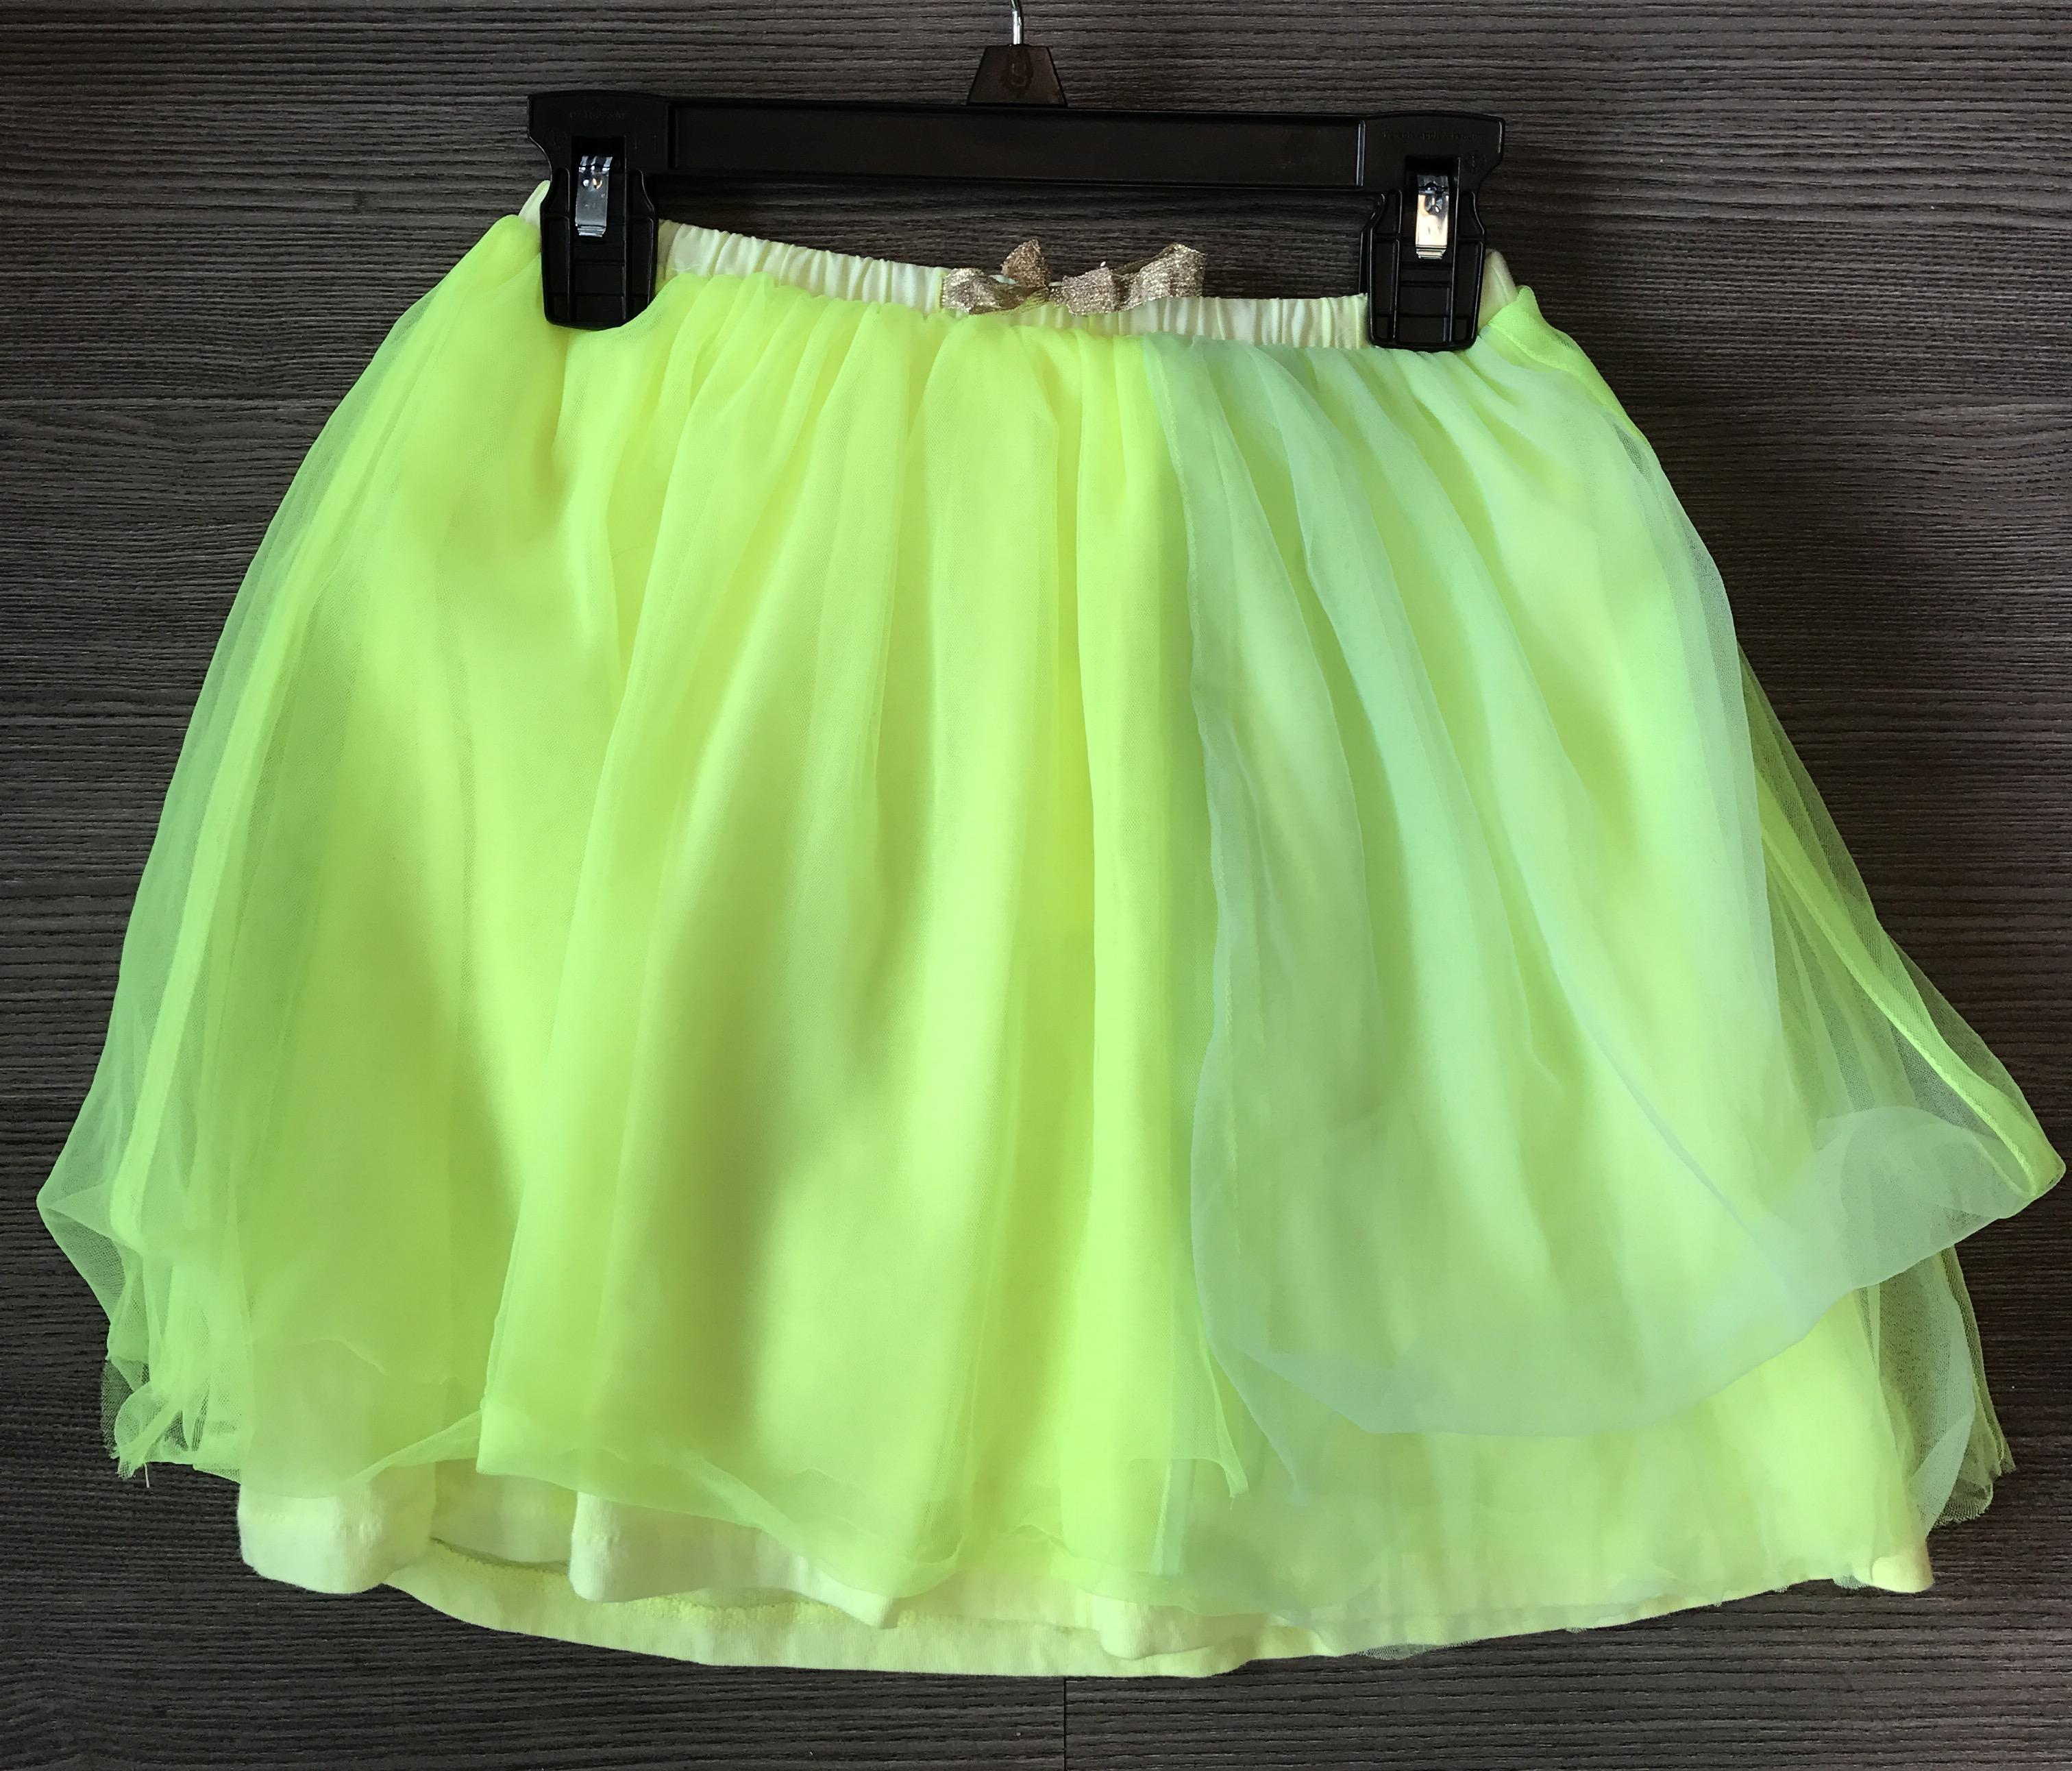 Crew-Cuts-Size-6-Neon-Skirt_7938A.jpg